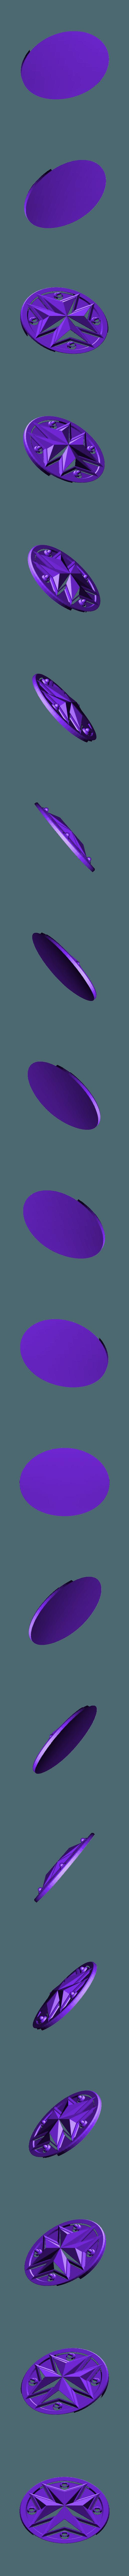 BLACK TEMPLAR SYMBOL.stl Download free STL file Logo Pack - Carapace • Design to 3D print, yaemhay